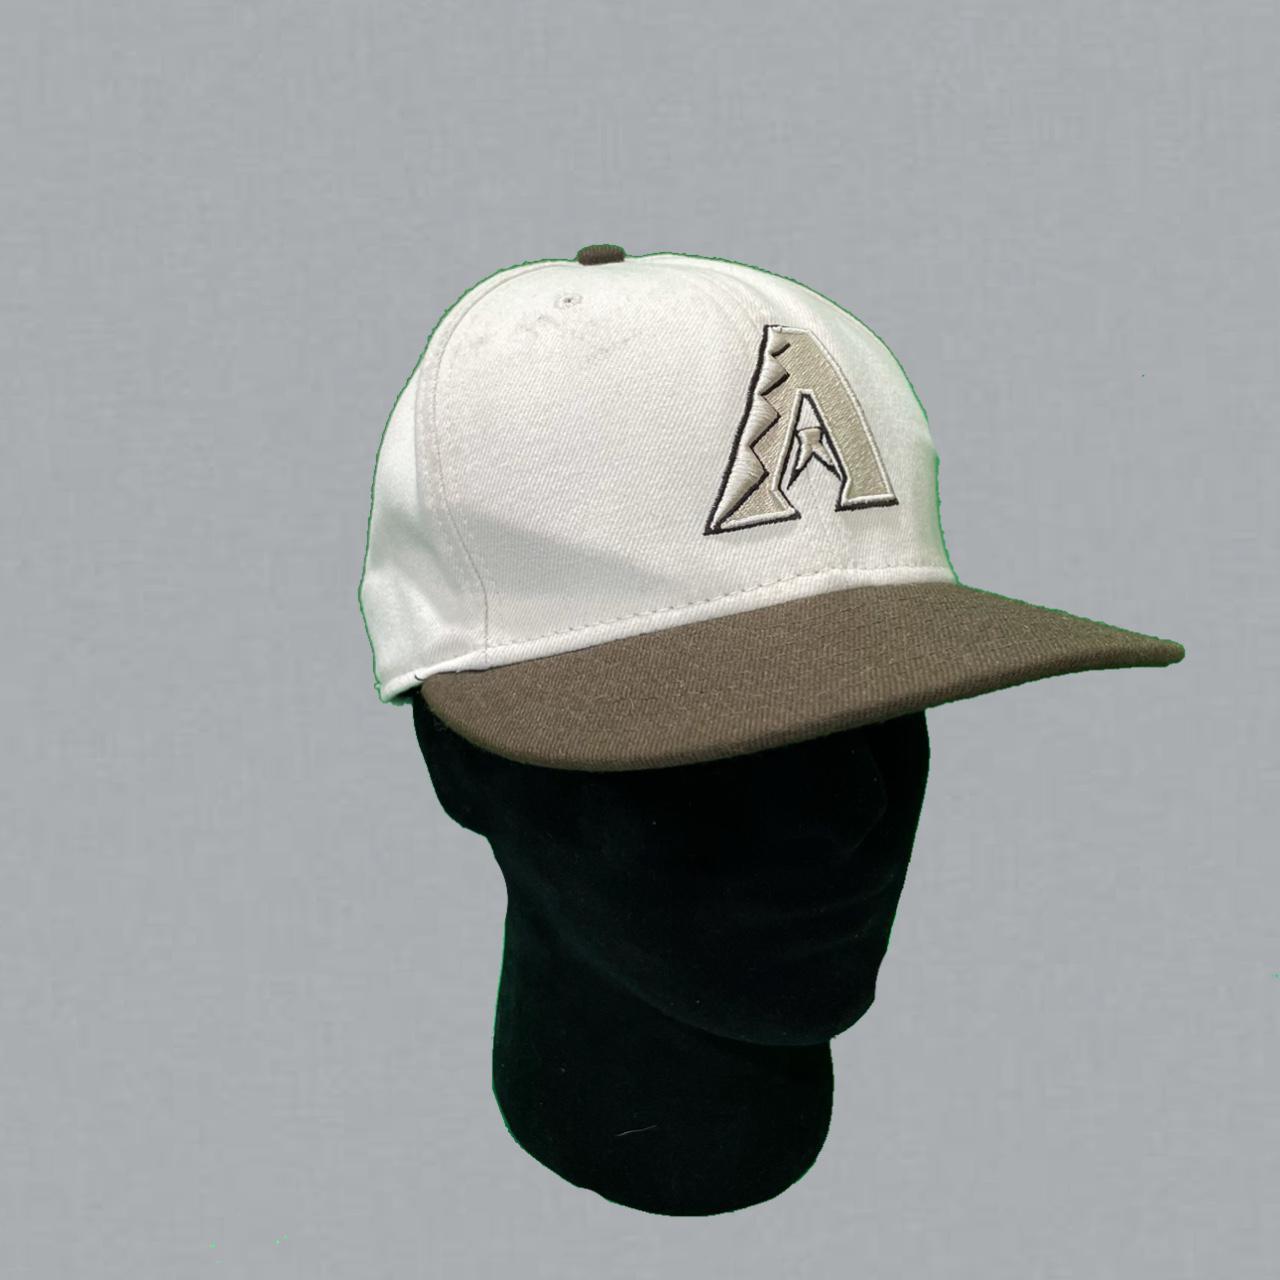 Product Image 1 - Cream/sand and brown Arizona Diamond